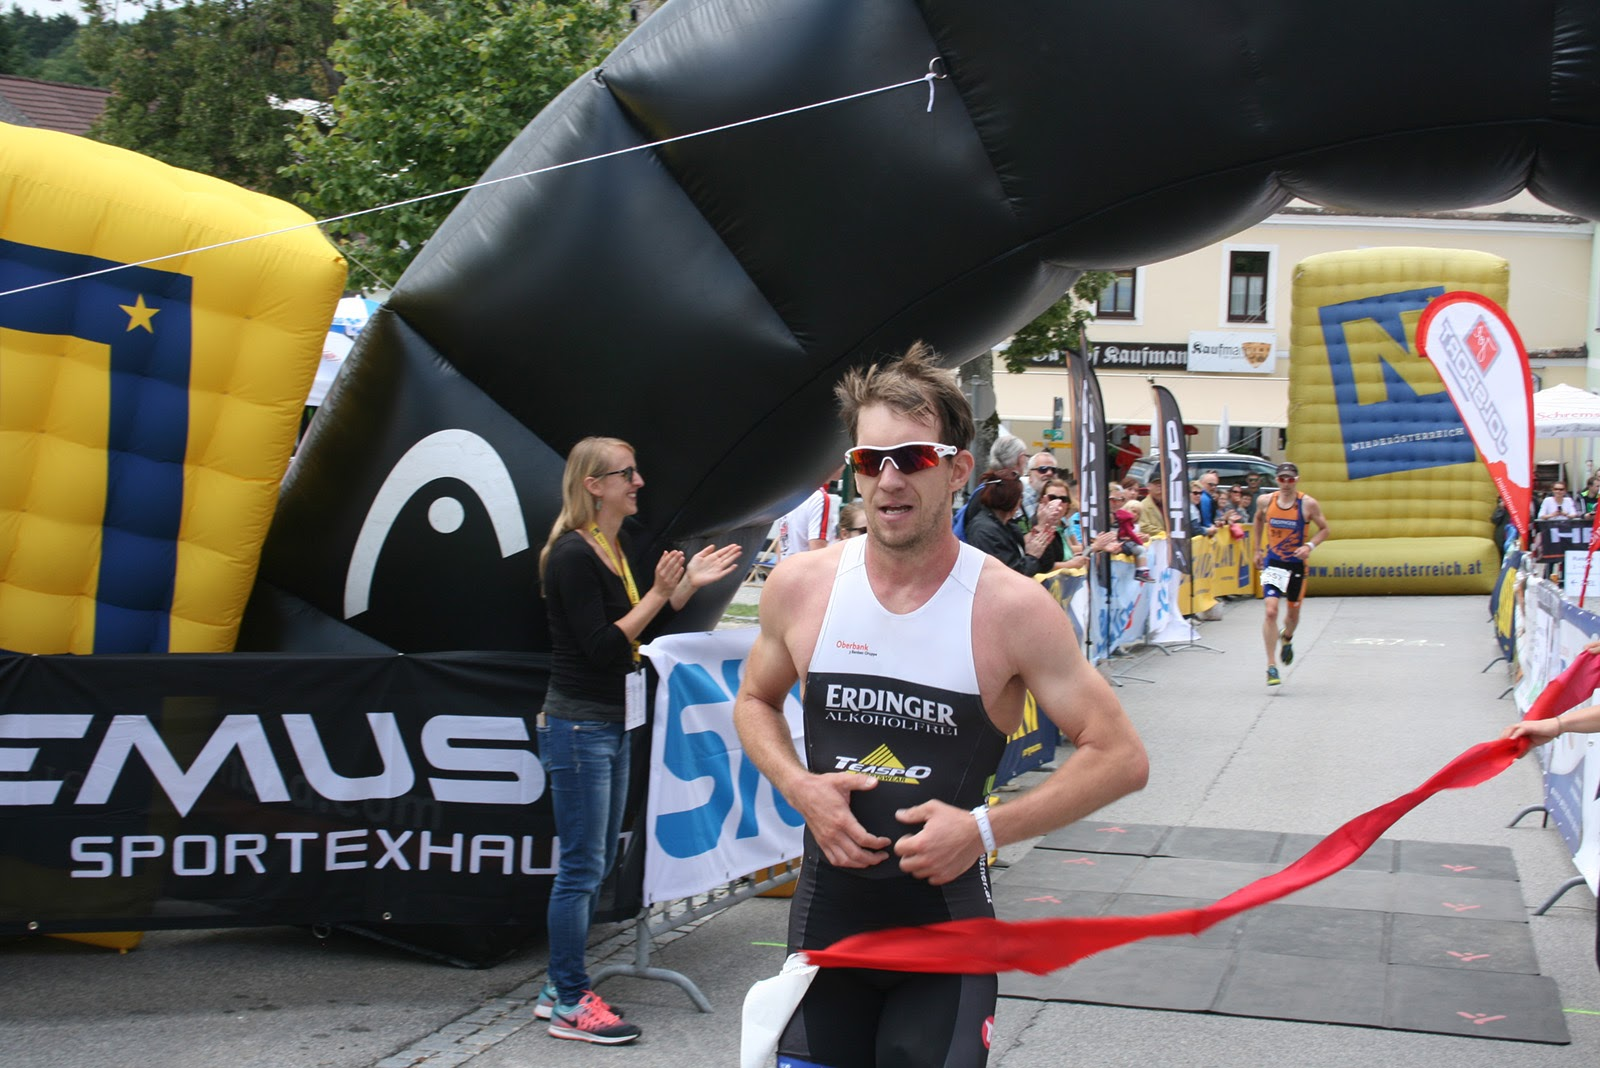 Christoph Kreindl